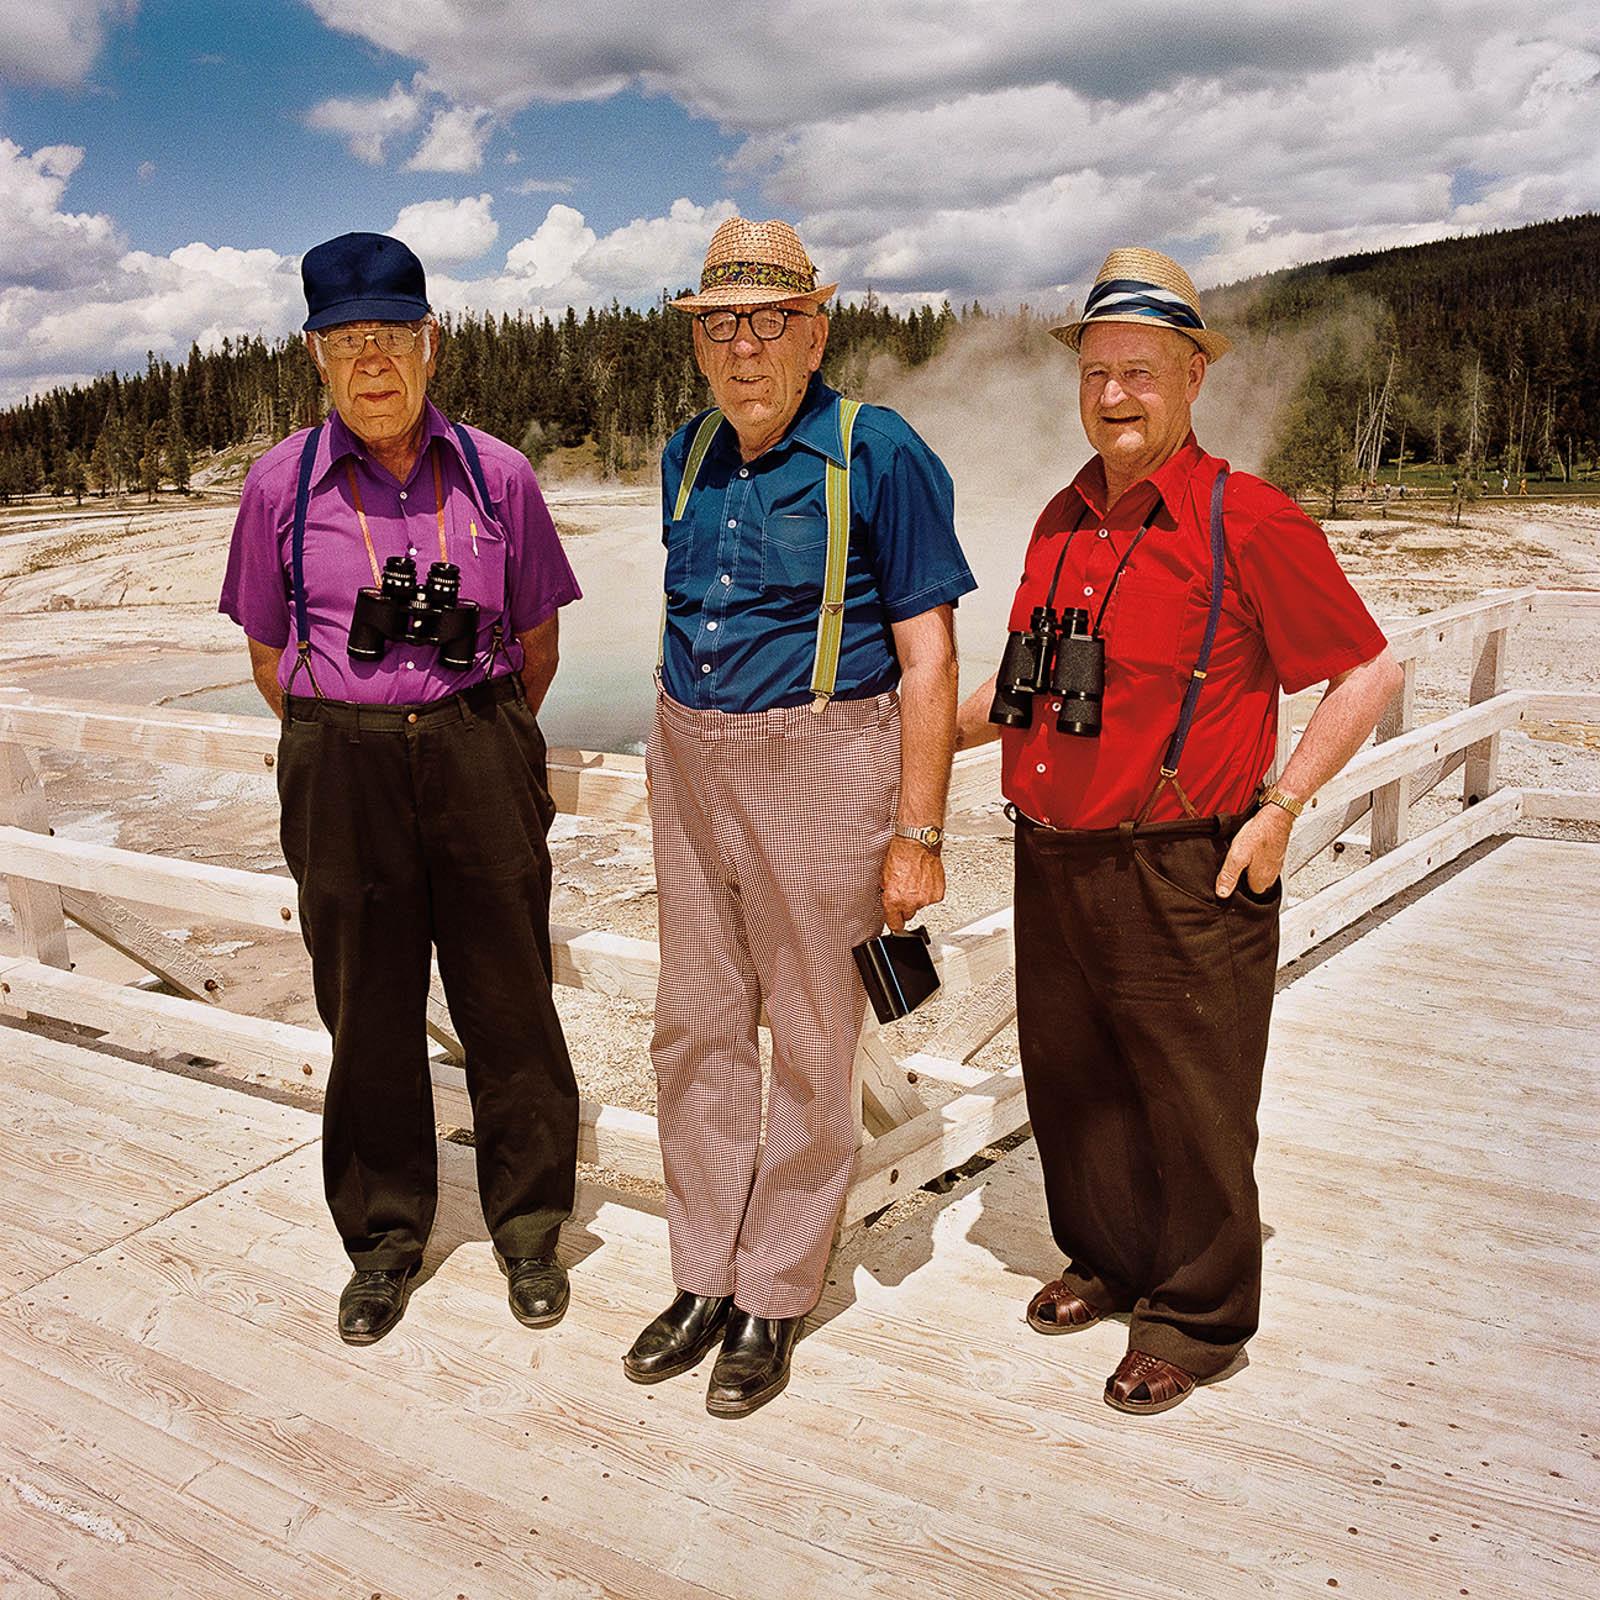 Three Men at Upper Geyser Basin, Yellowstone National Park, Wyoming 1980